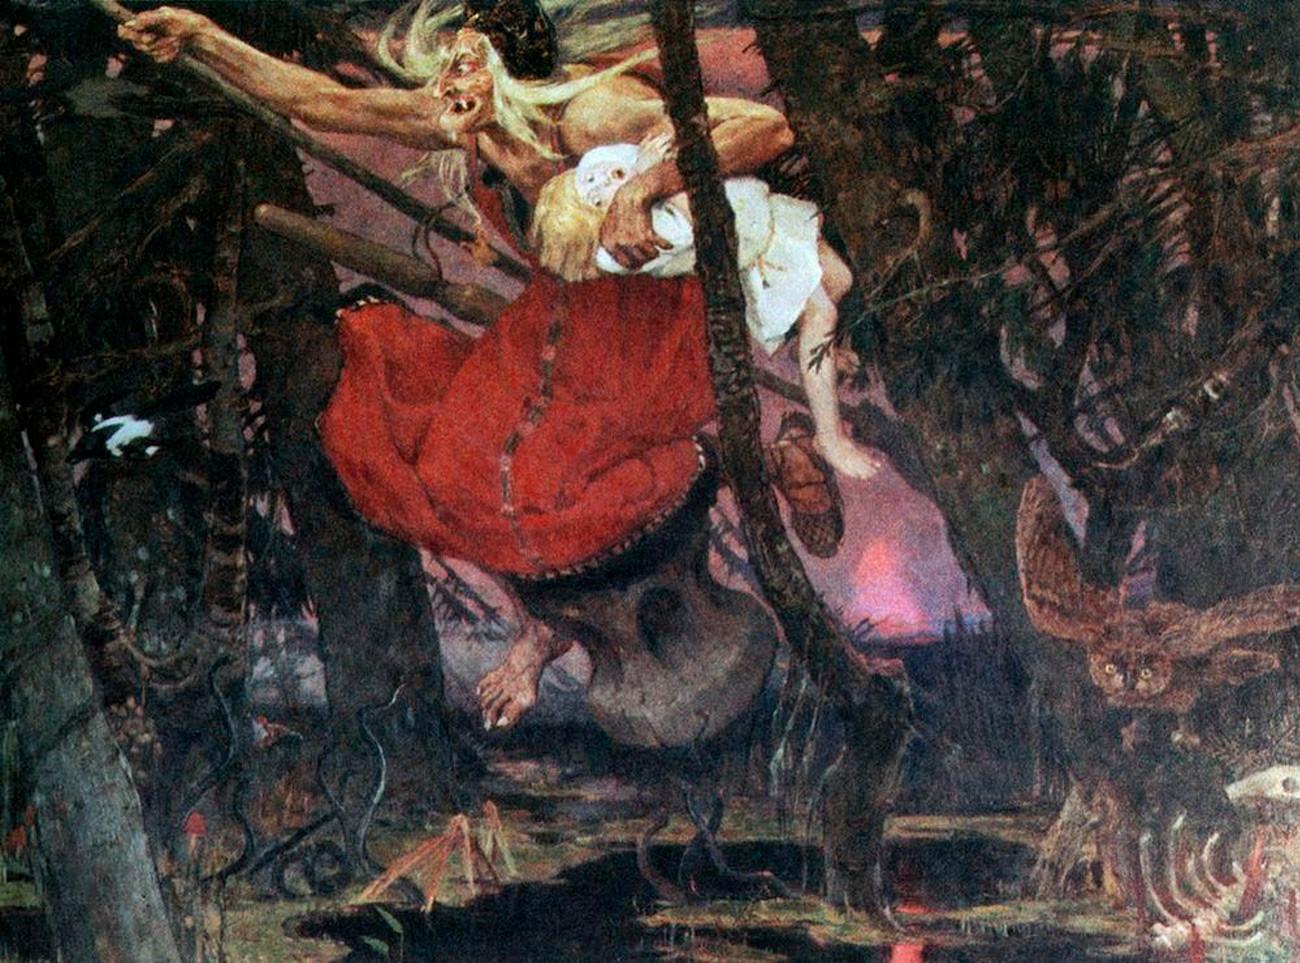 Bába Iagá pintada por Víktor Vasnetsóv.